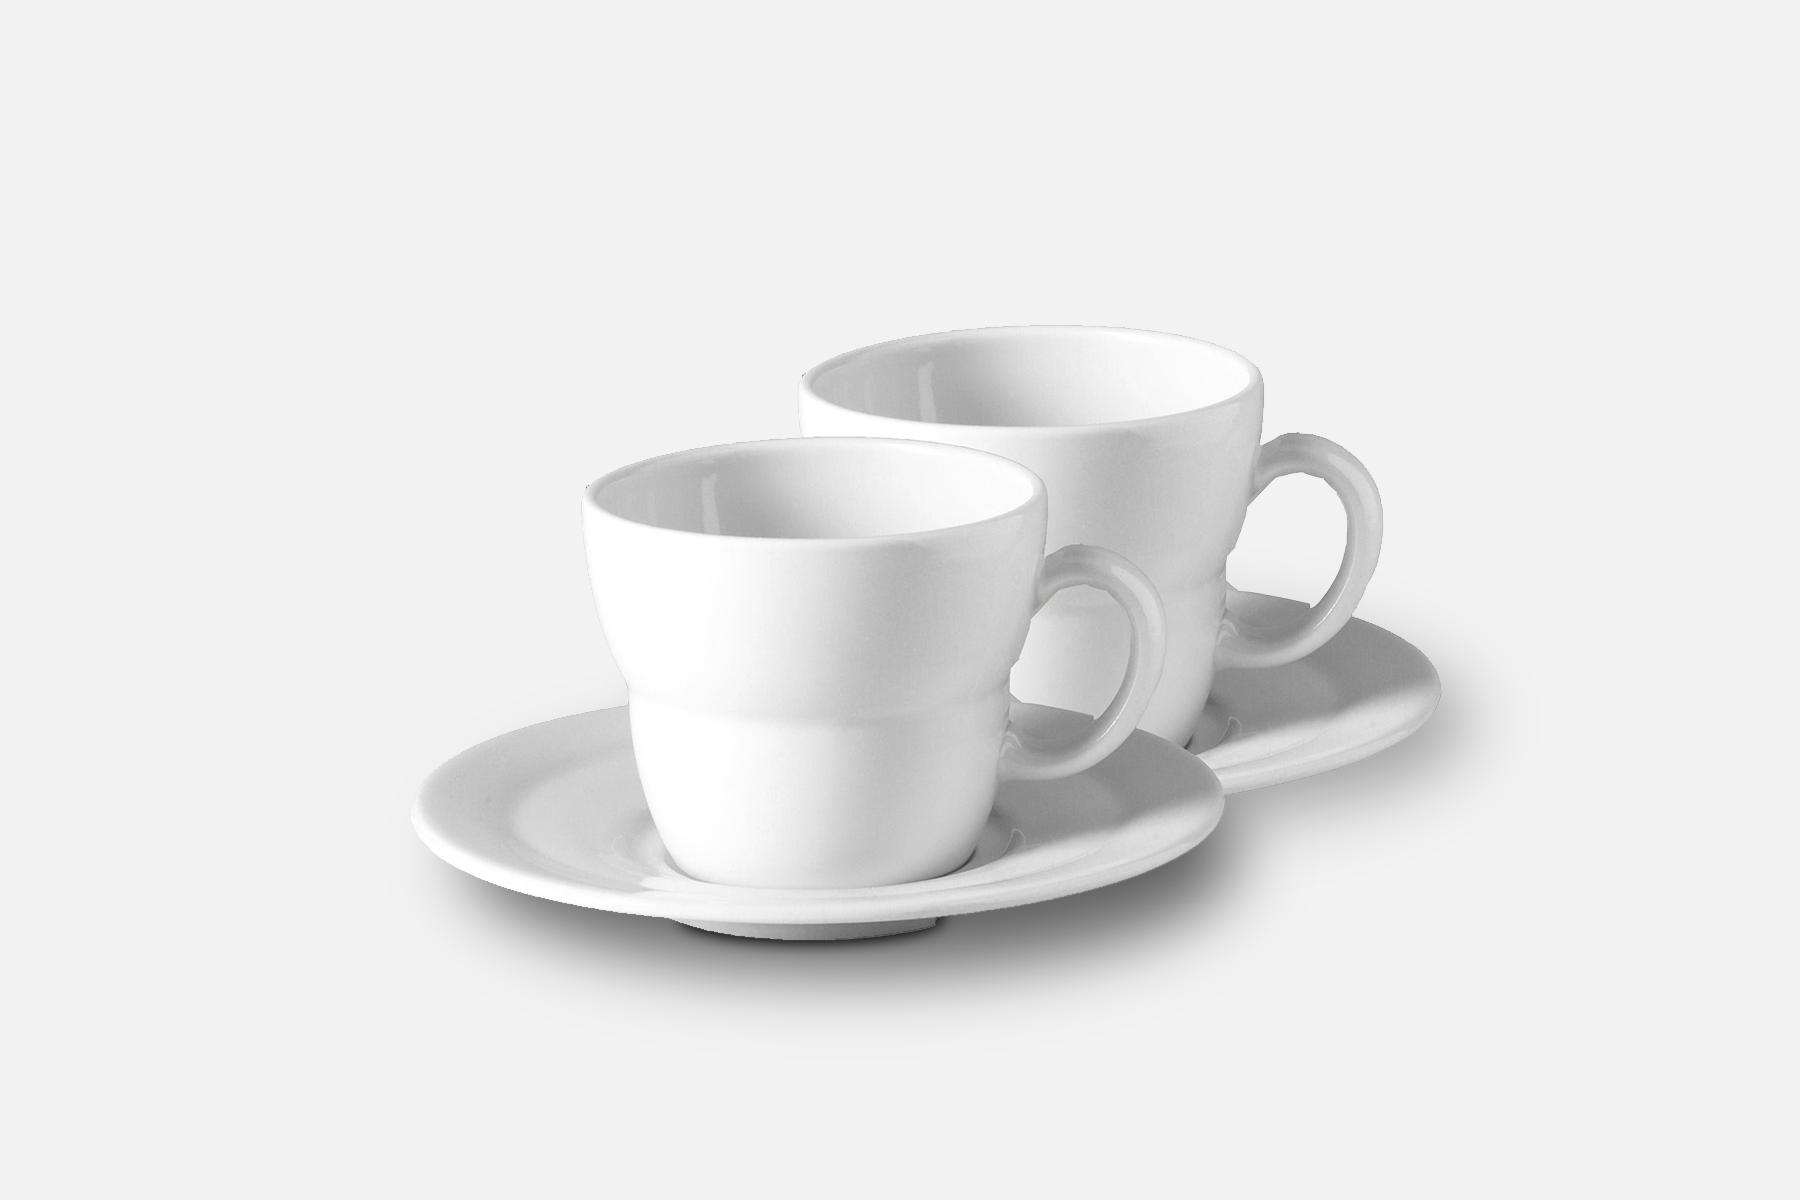 Kaffekop m. Underkop - 2 stk, 21 clPorcelænDesign by Erik BaggerArt. nr.: 60102